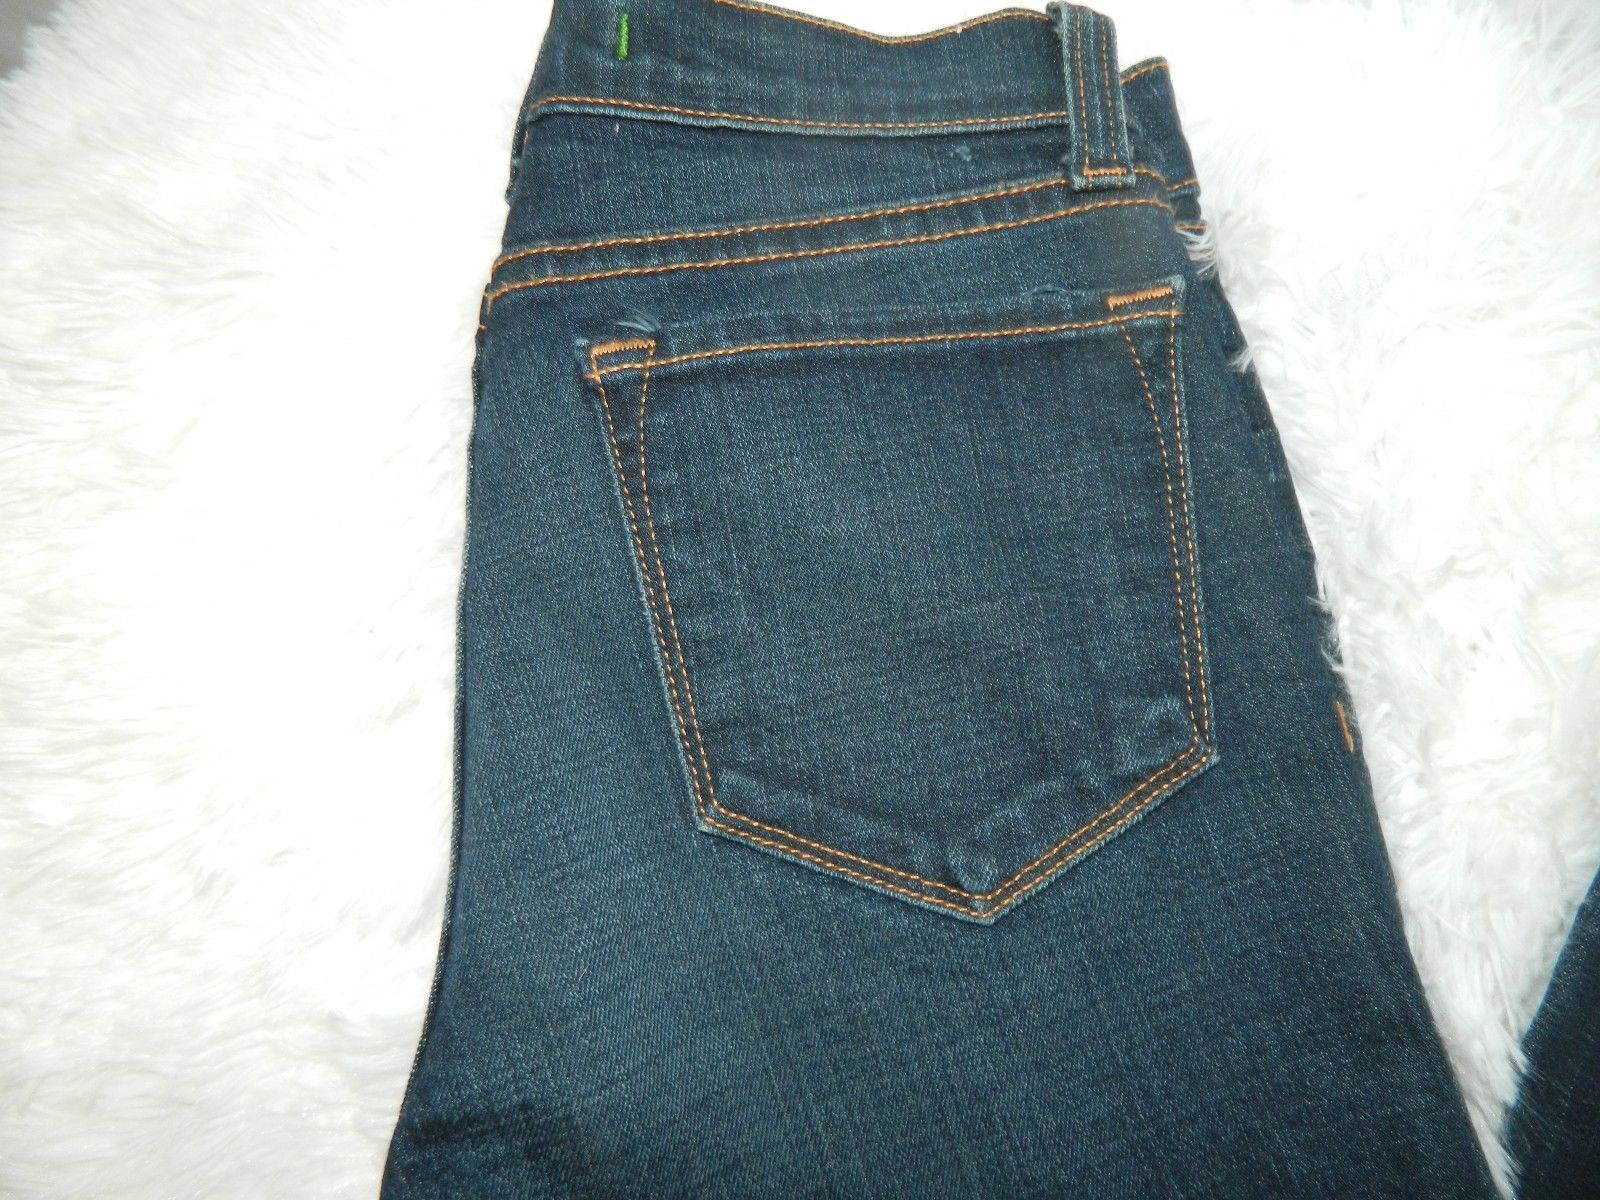 J Brand Jeans Straight Leg Jeans  Dark Wash Style #805 Size 25 image 6